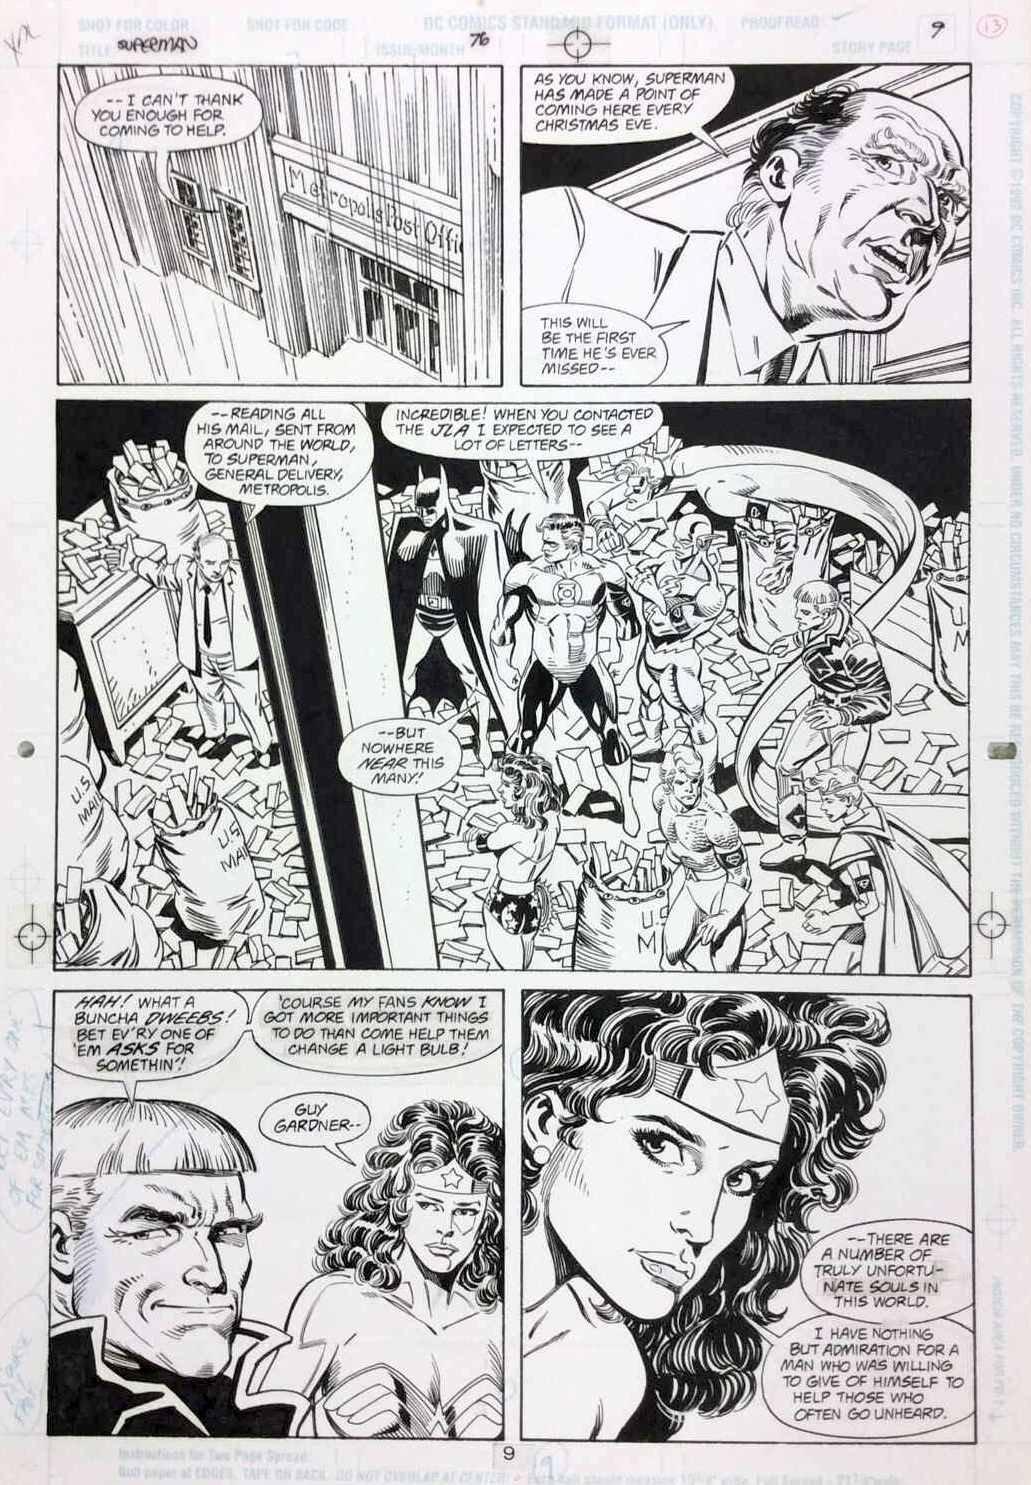 JURGENS, DAN - Superman #76 pg 9, Supes death & Funeral for Friend ...